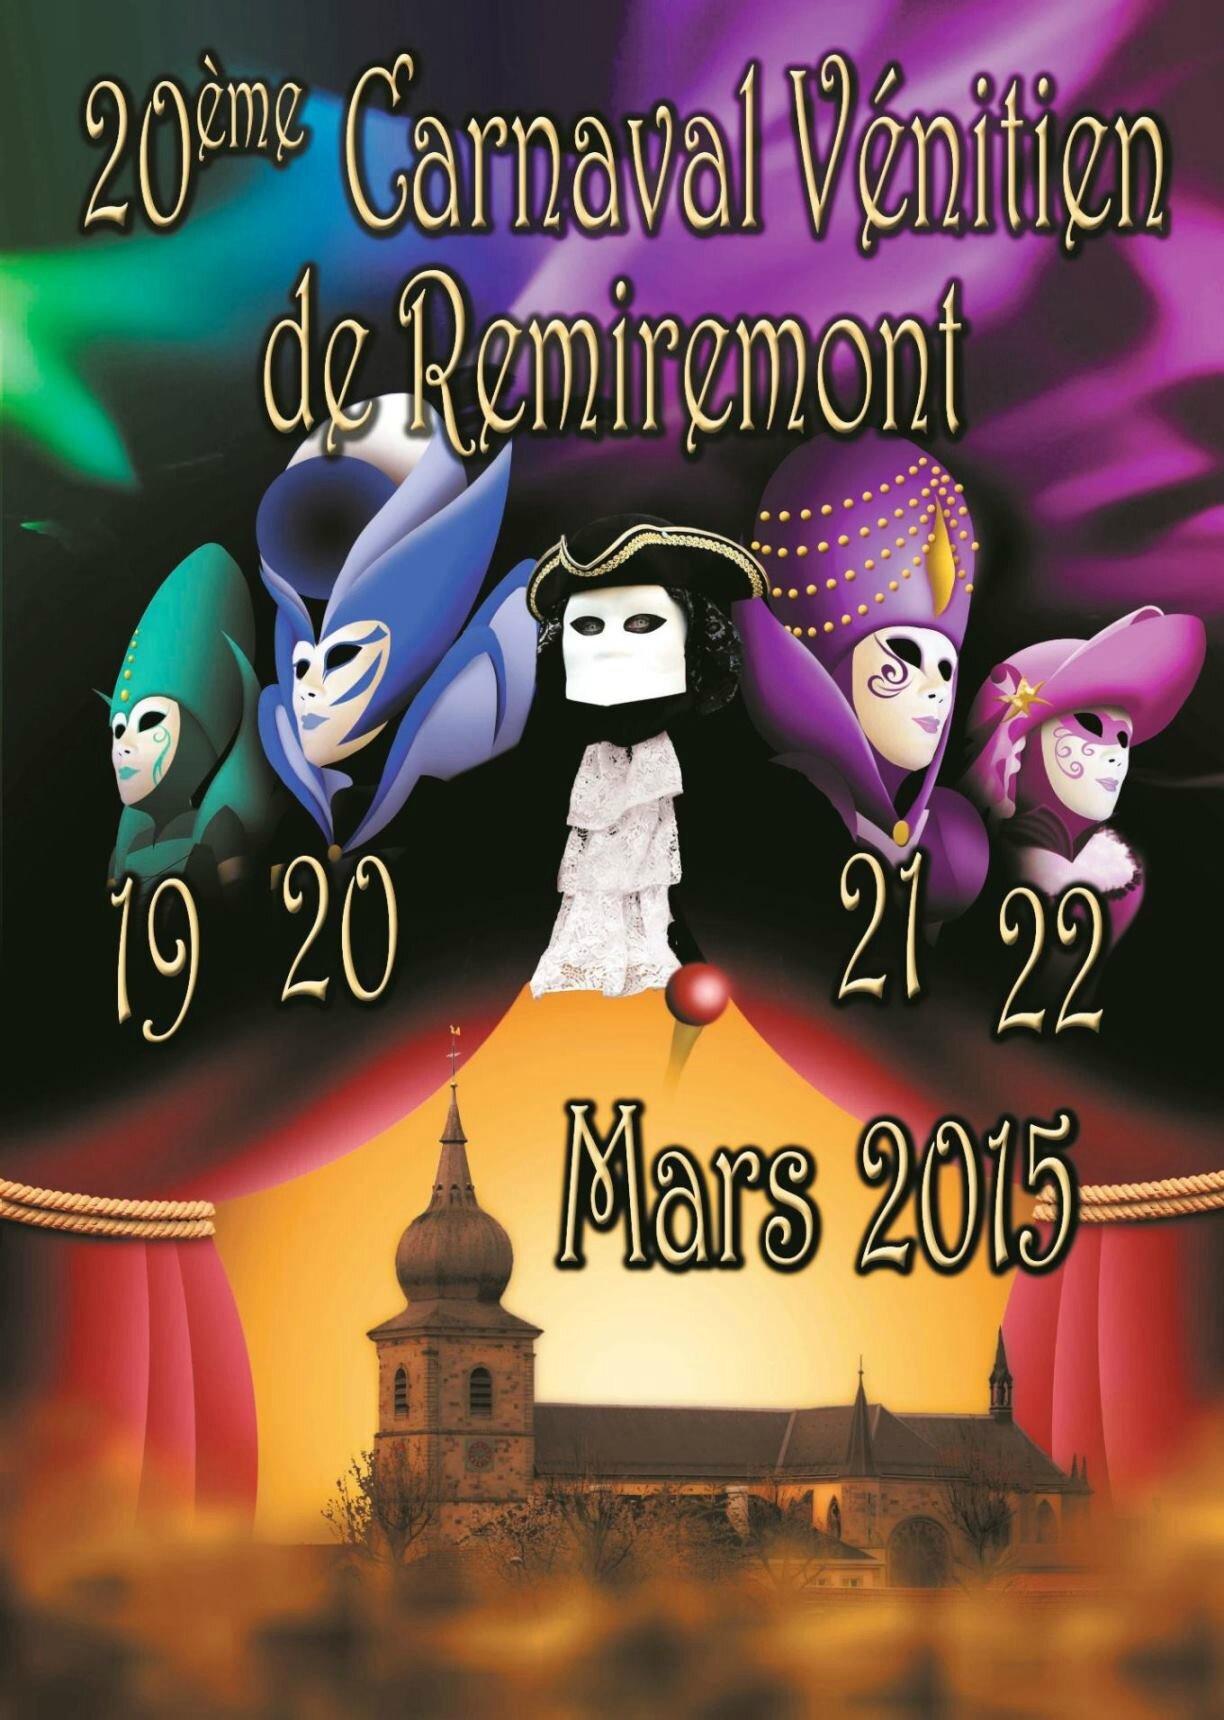 Remiremont Carnaval 2015